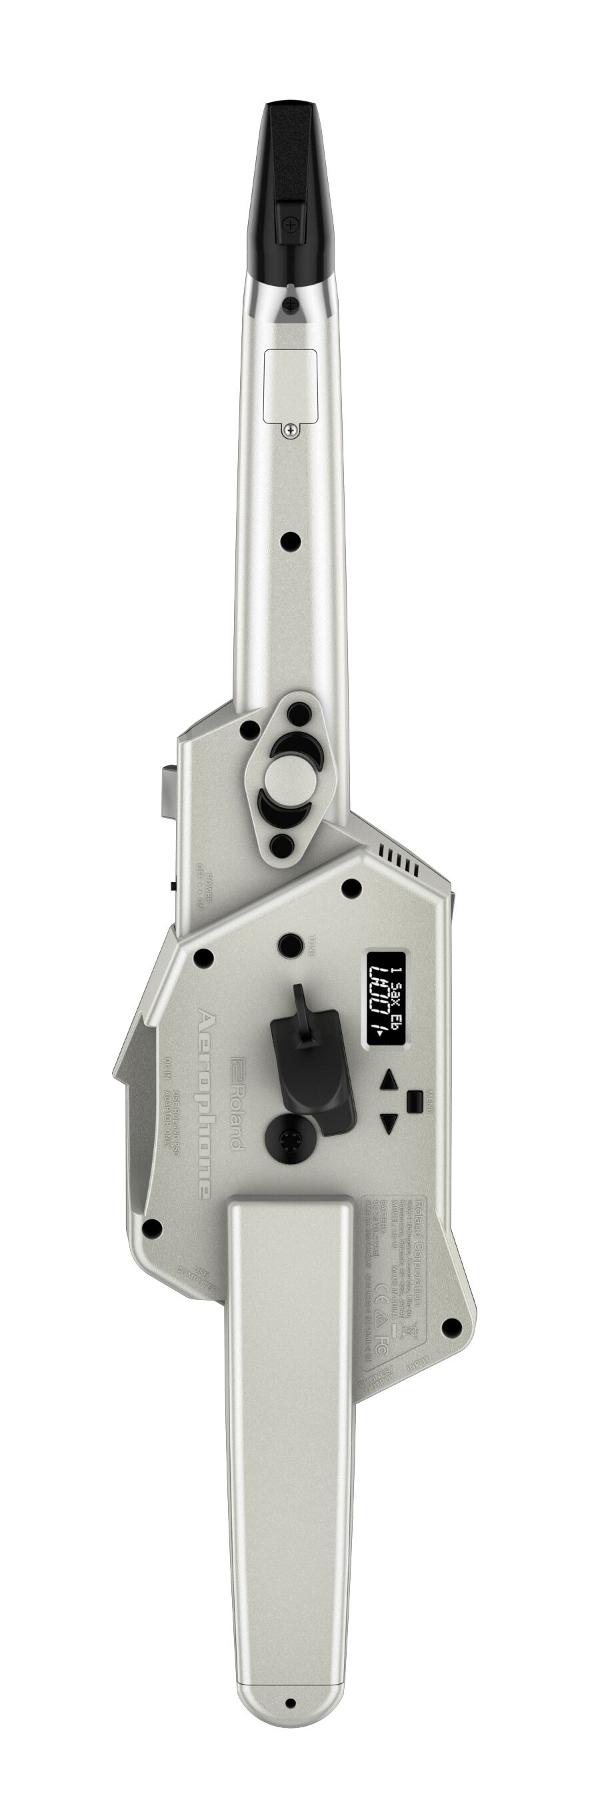 Roland Aerophone AE-10 Digital Wind Instrument AE-10